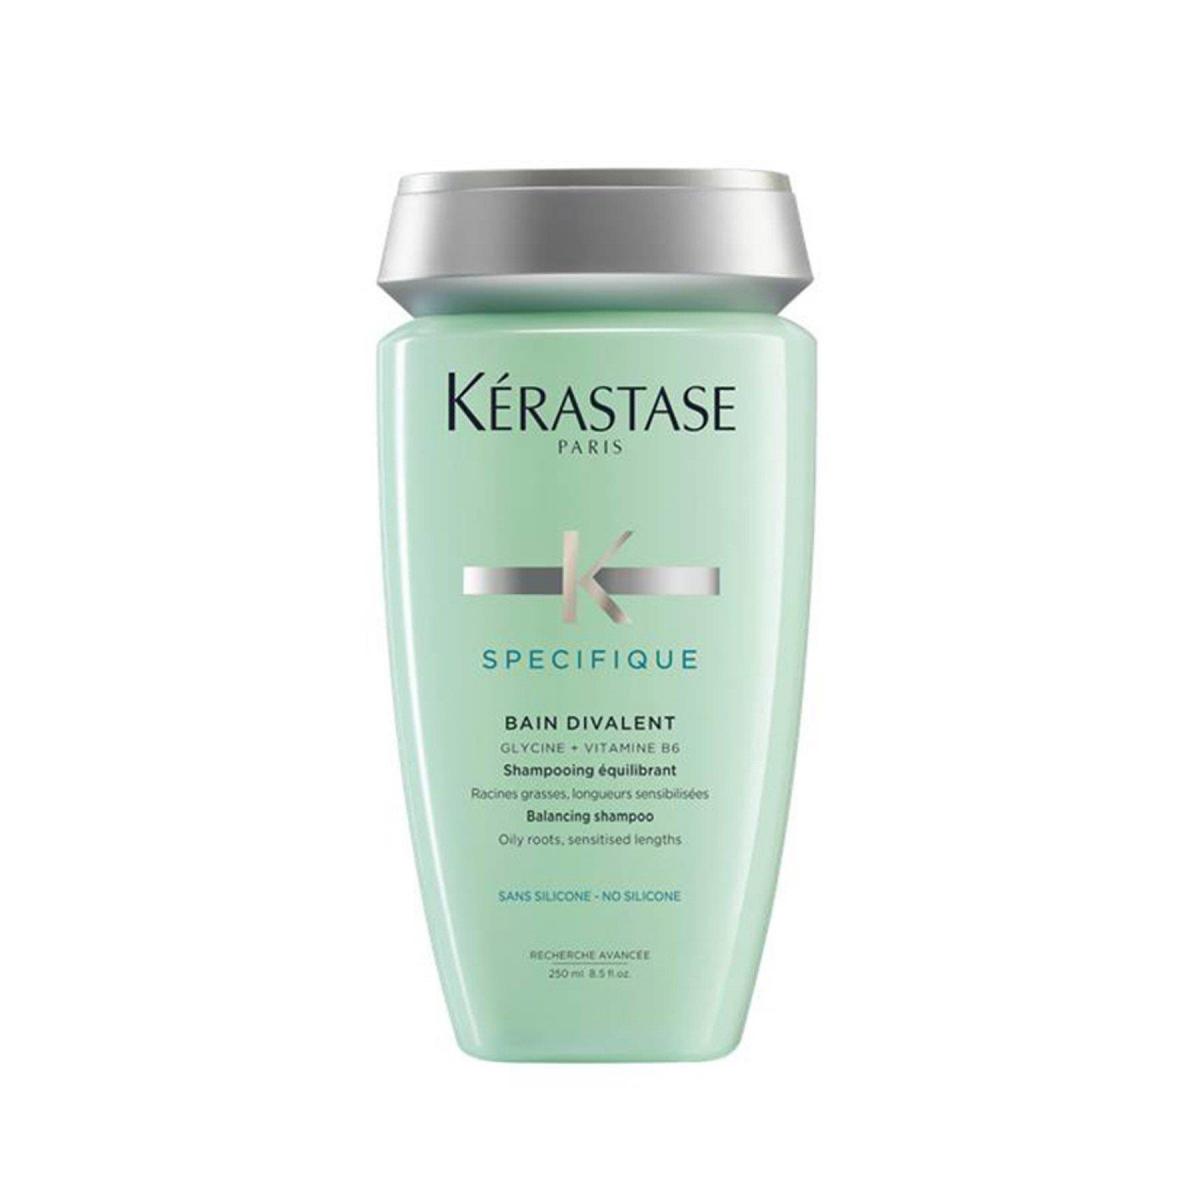 Kerastase Specifique Bain Divalent Dengeleyici Şampuan 250ml